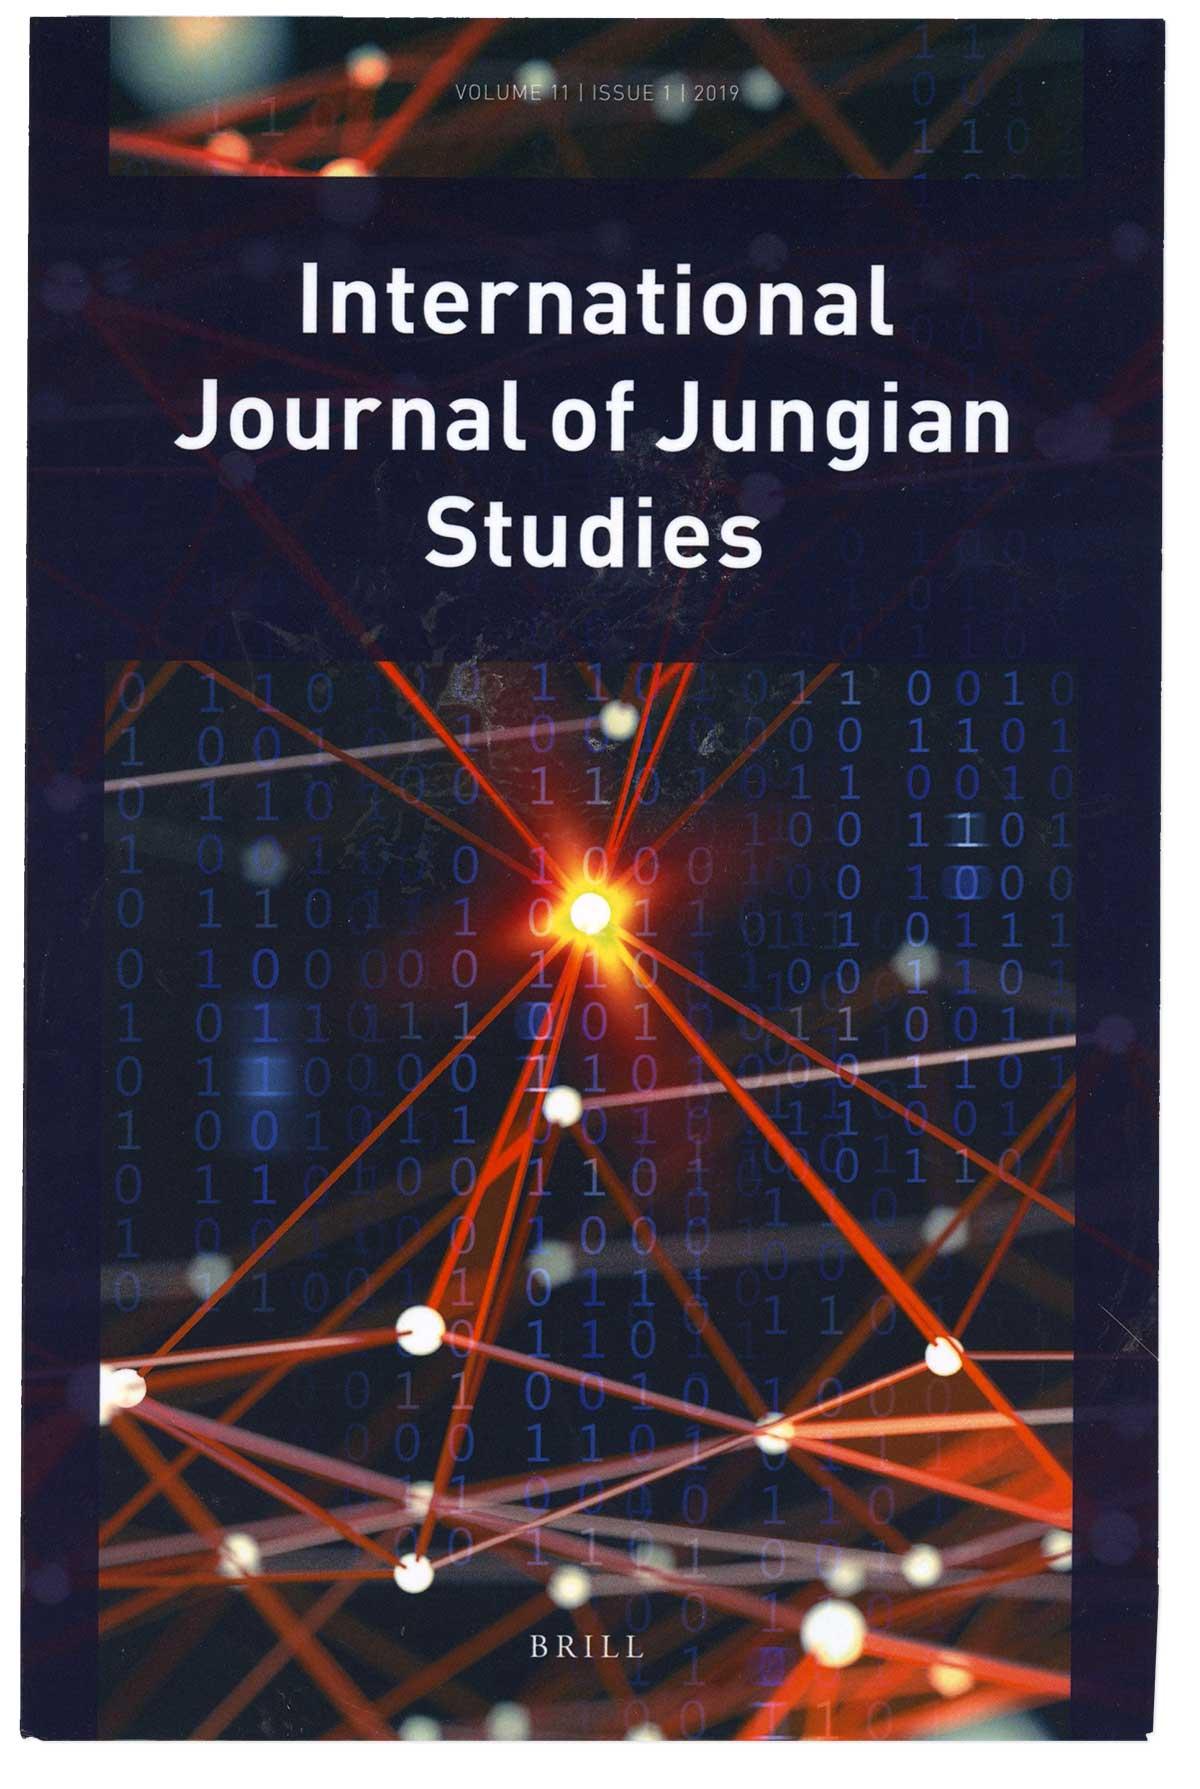 The International Journal of Jungian Studies (IJJS)